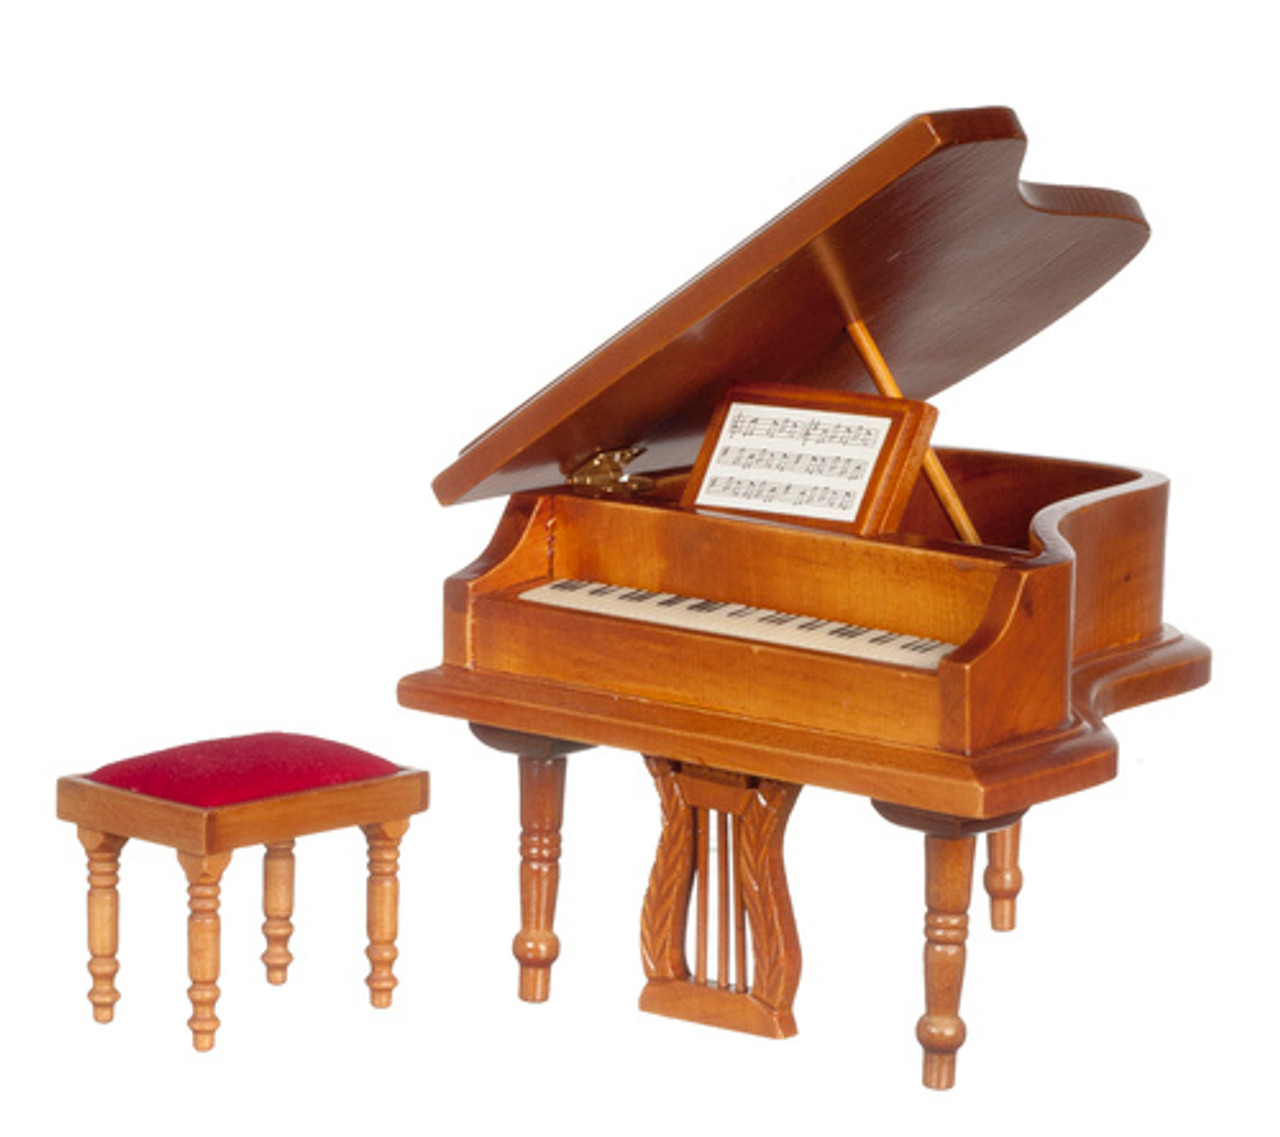 Piano With Bench - Walnut